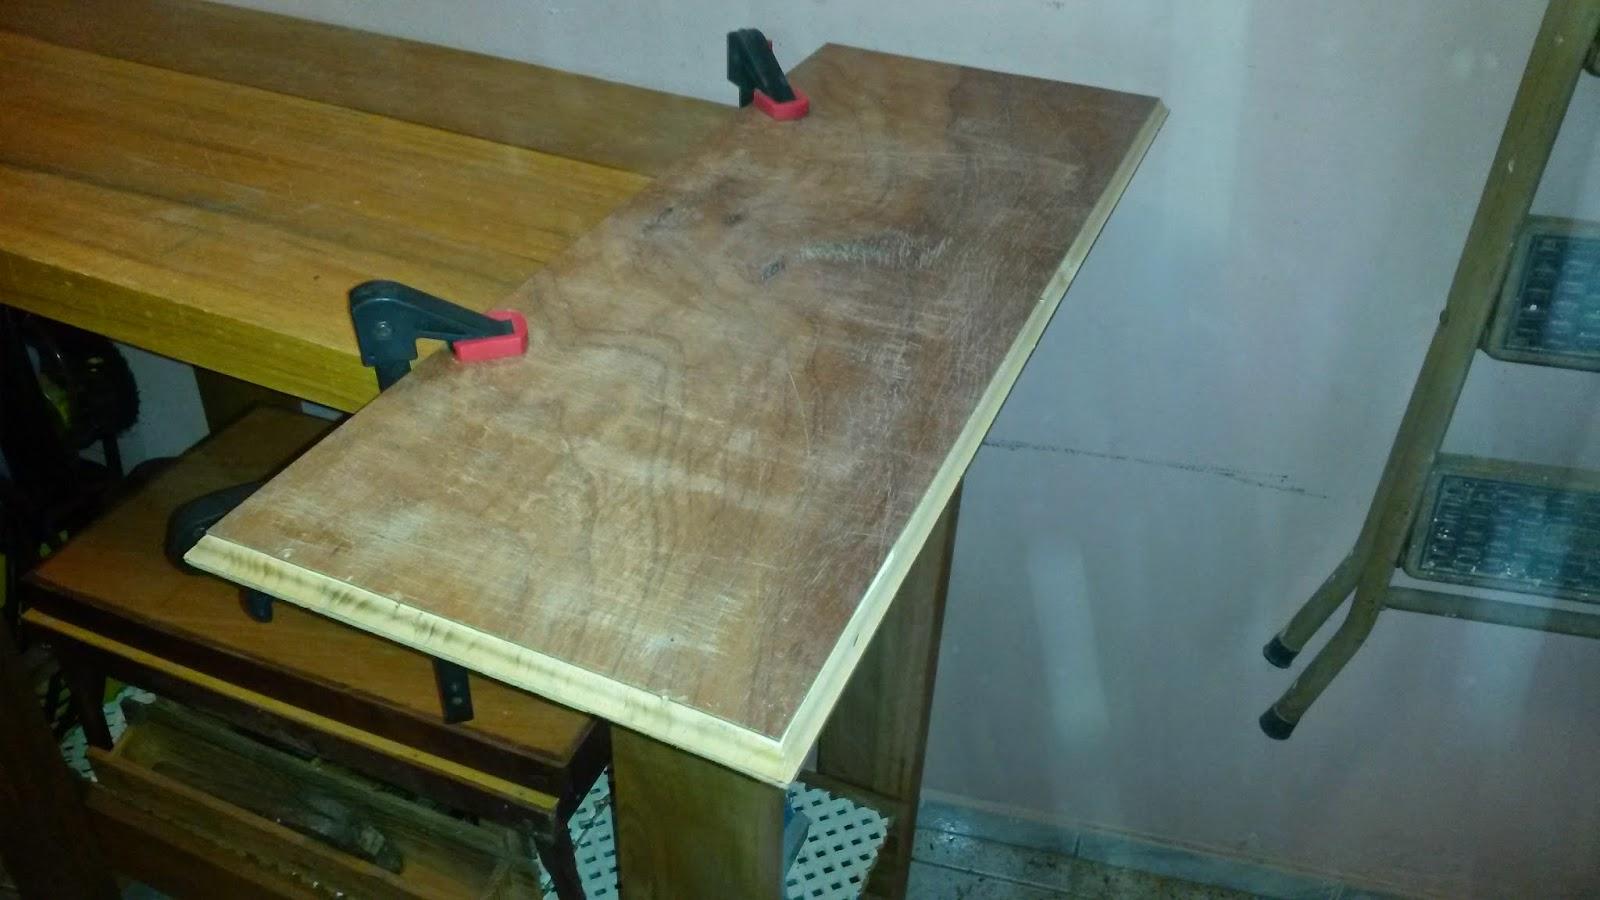 tampo e para isso utilizei ripas de madeira que cortei e lixei #604A1B 1600x900